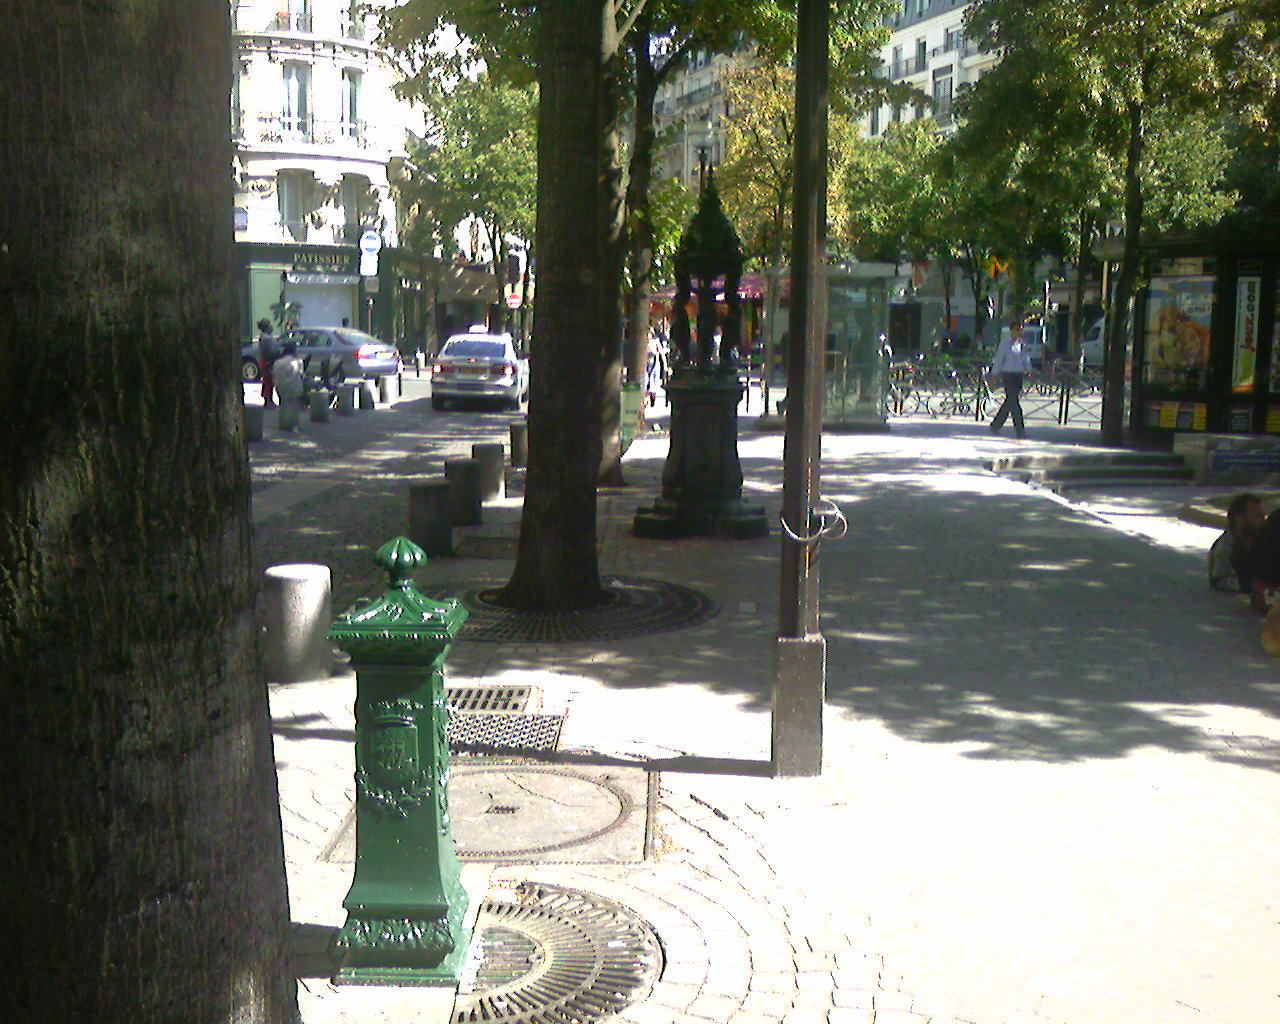 Mobilier urbain for Mobilier urbain espace public